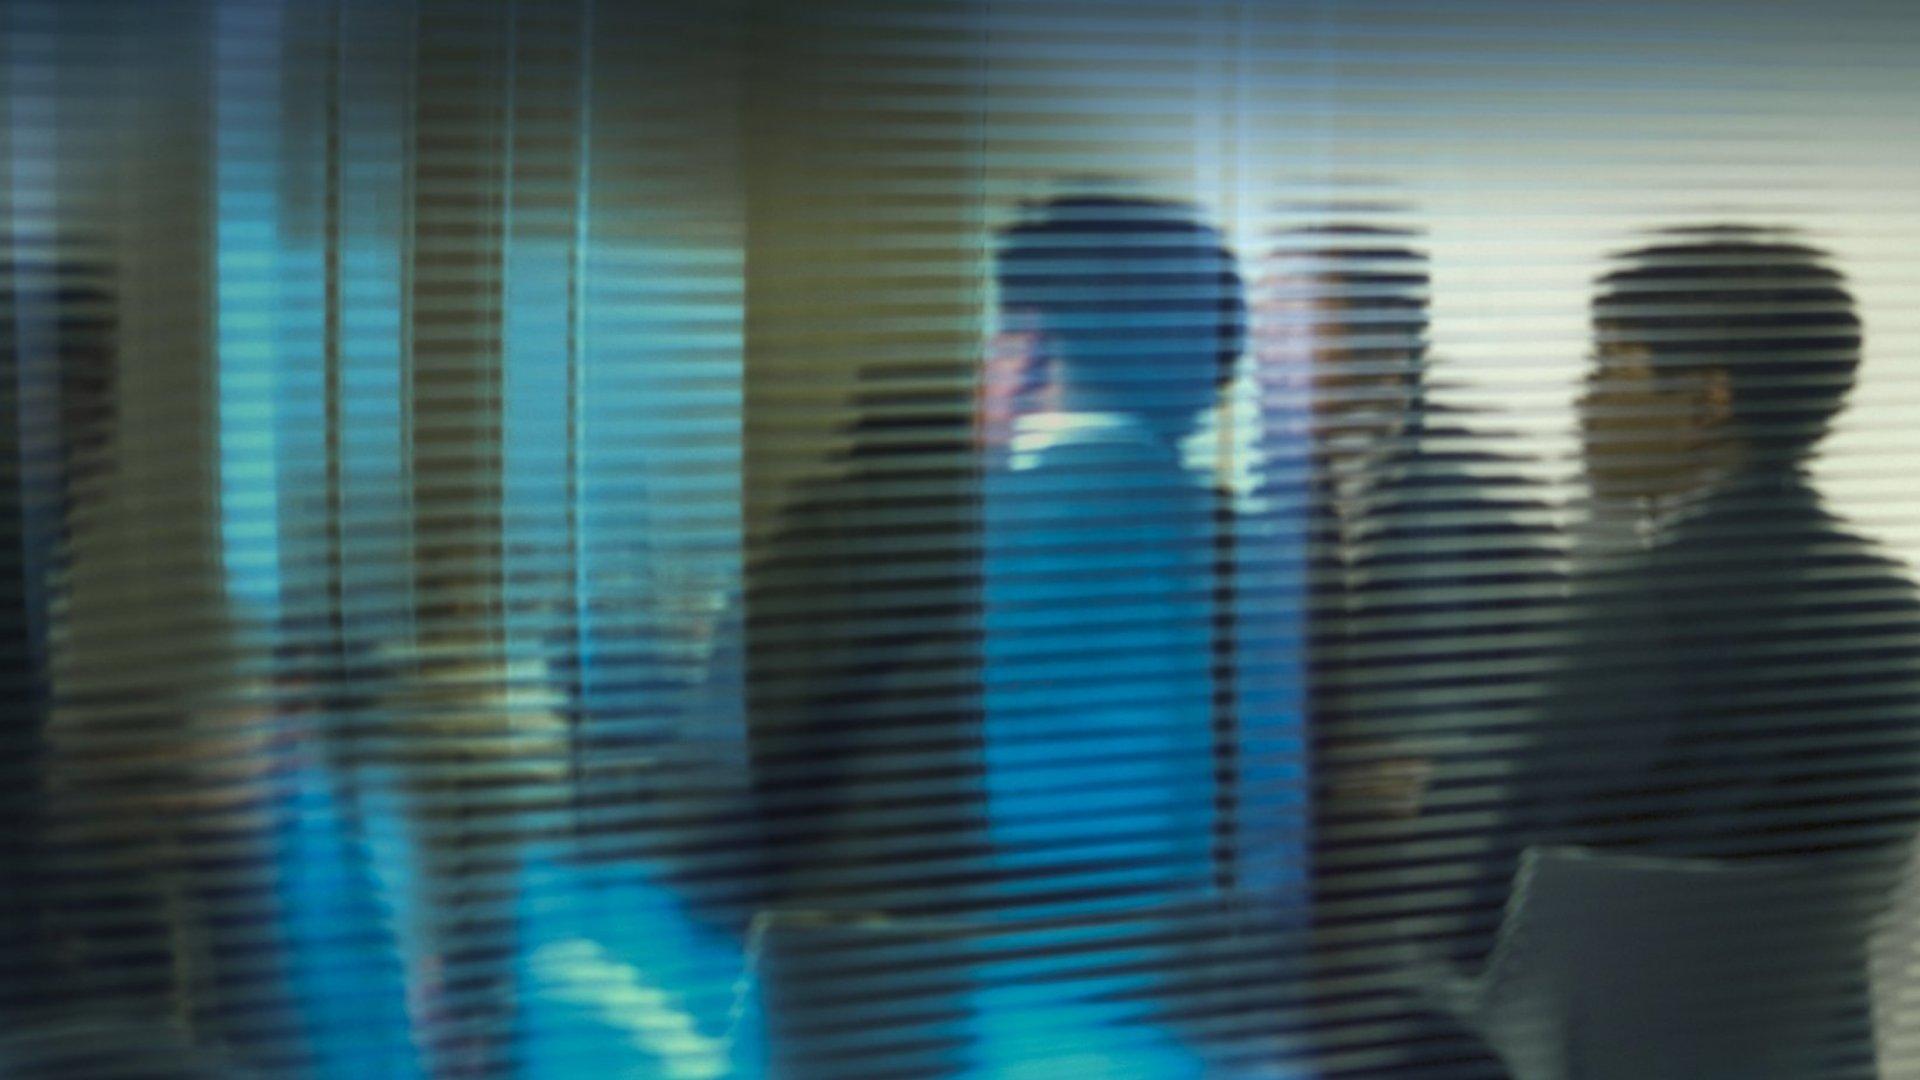 Top 10 Boss Behaviors Every Employee Hates